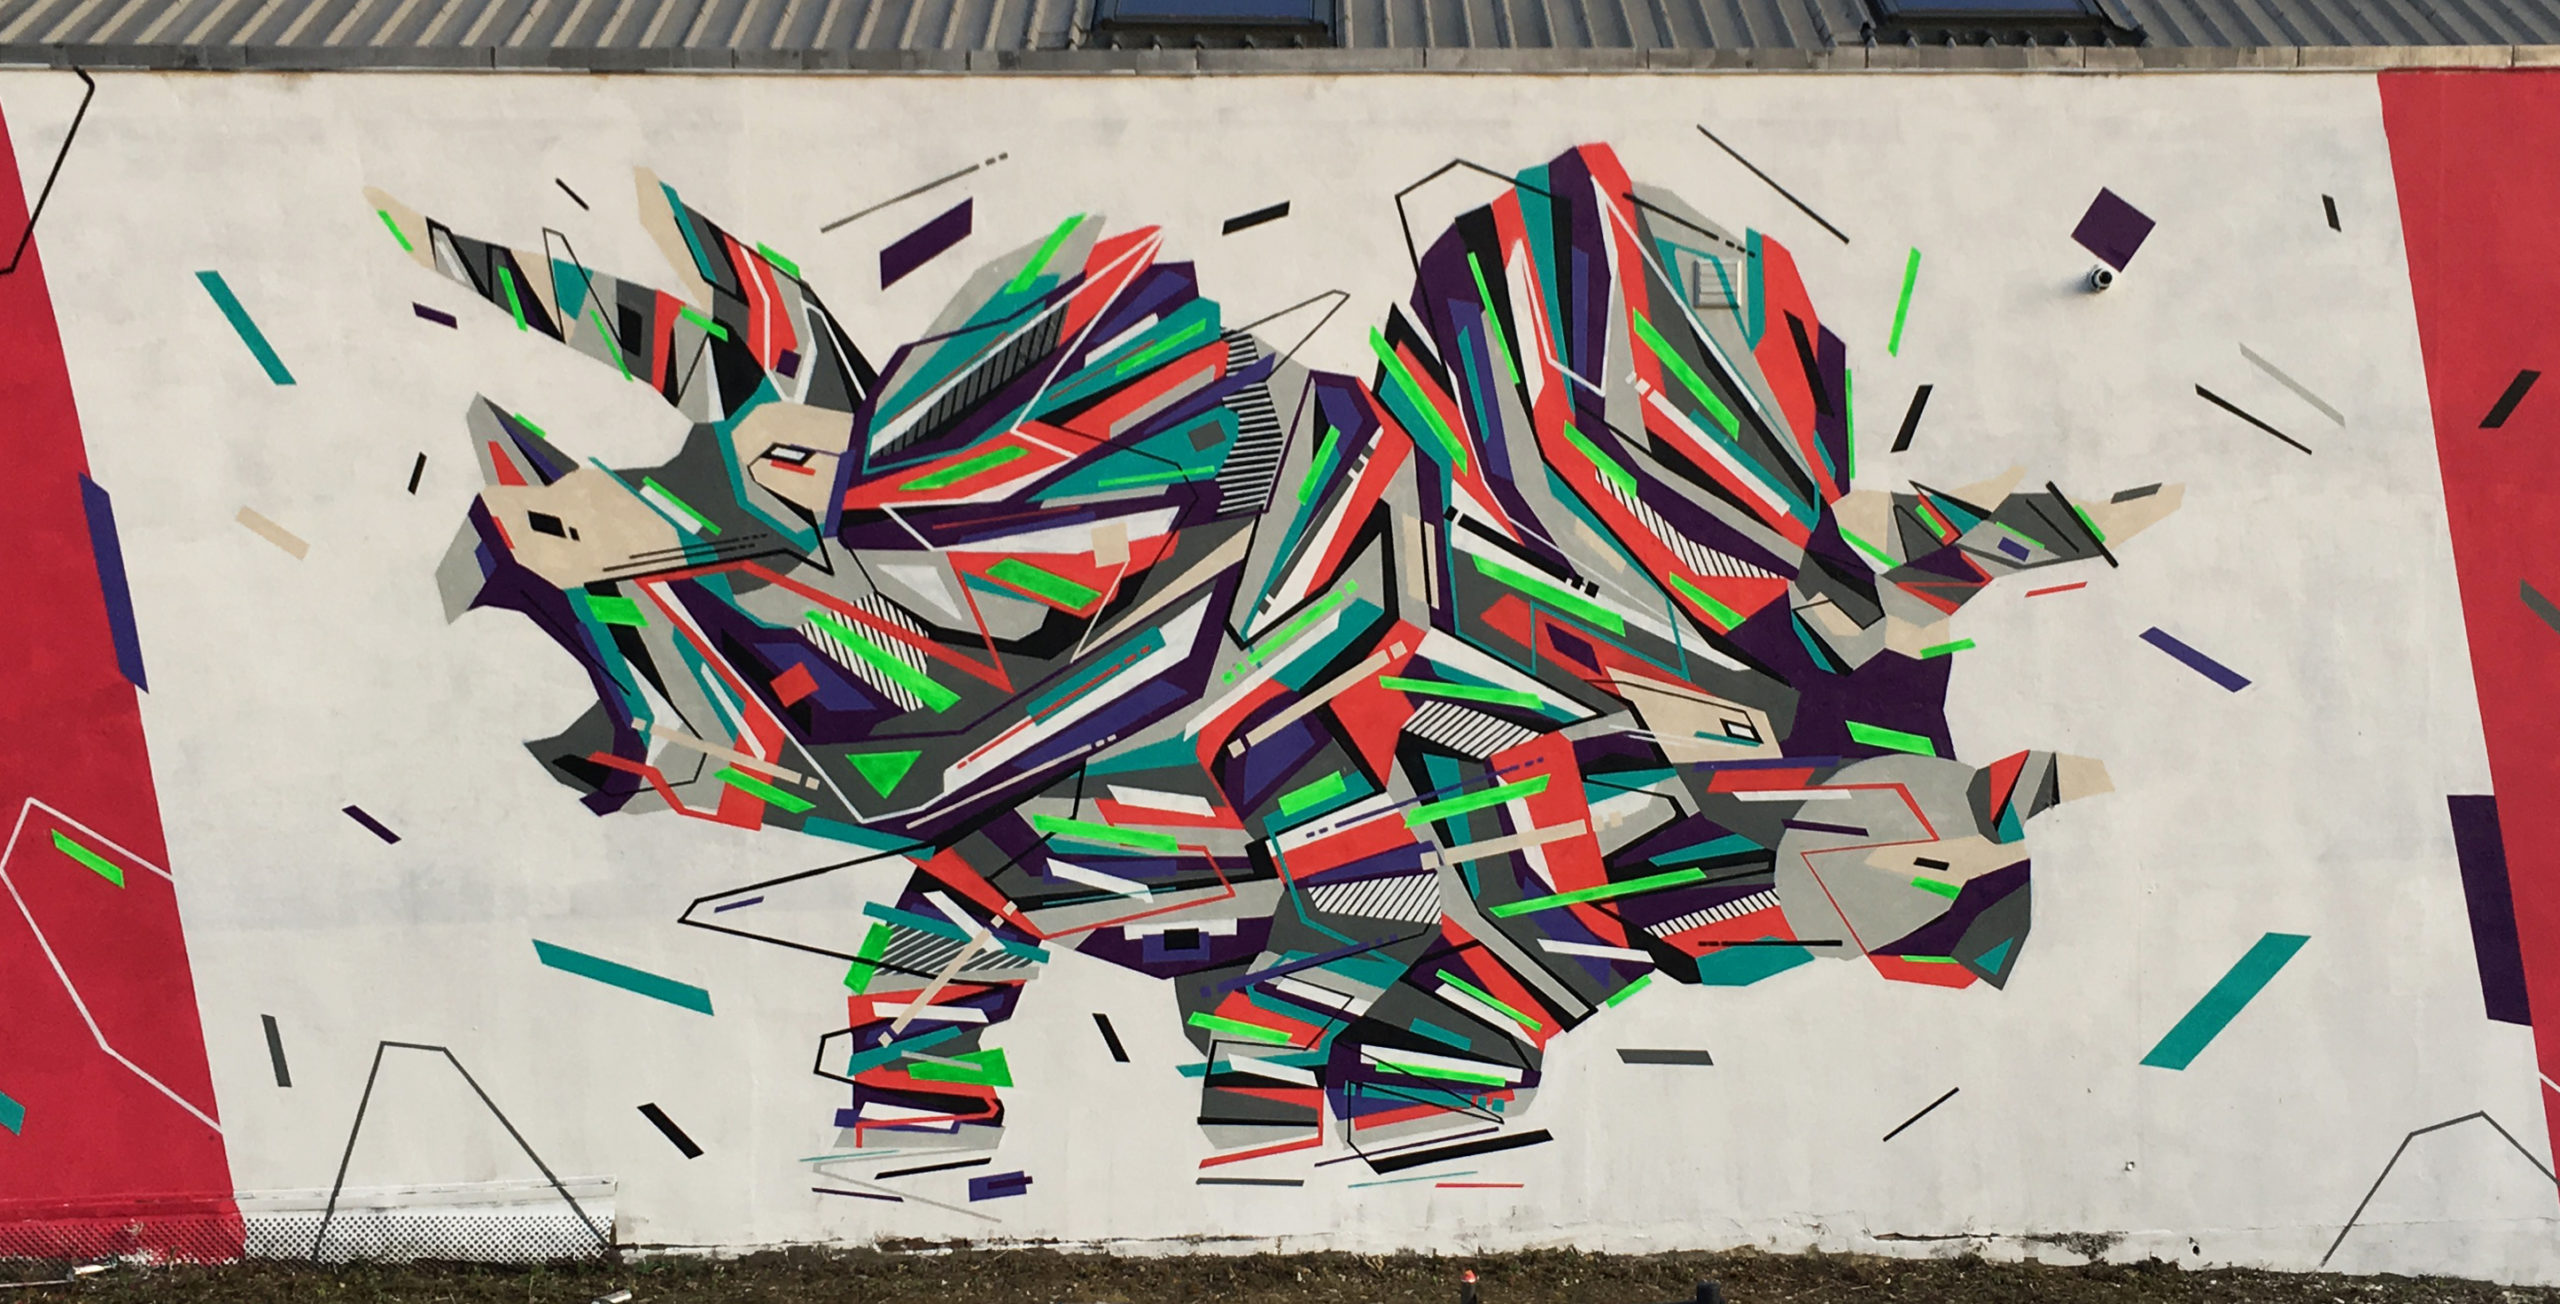 Fresque Graffaune Graffiti tricératops réalisée par Daco